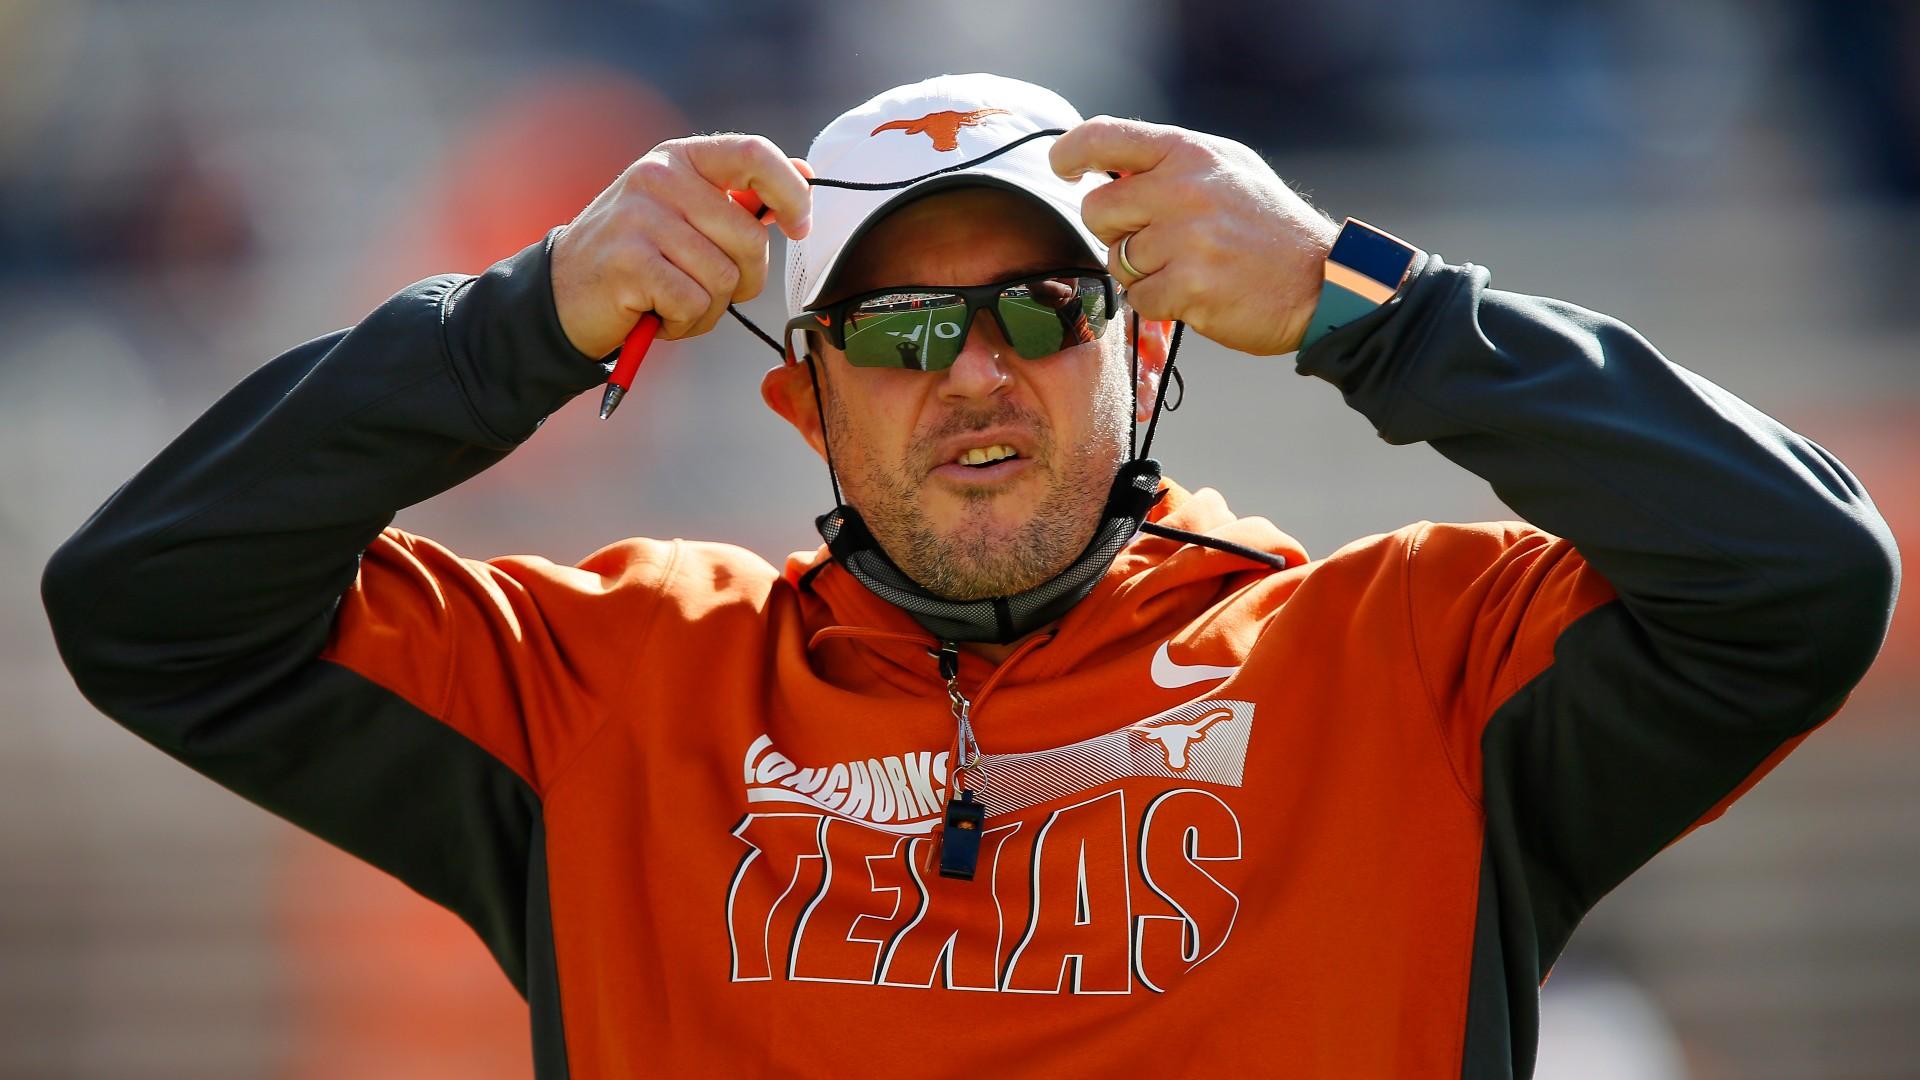 Texas coaching rumors: Tom Herman's hot seat, Urban Meyer's candidacy fuel speculation around Longhorns job